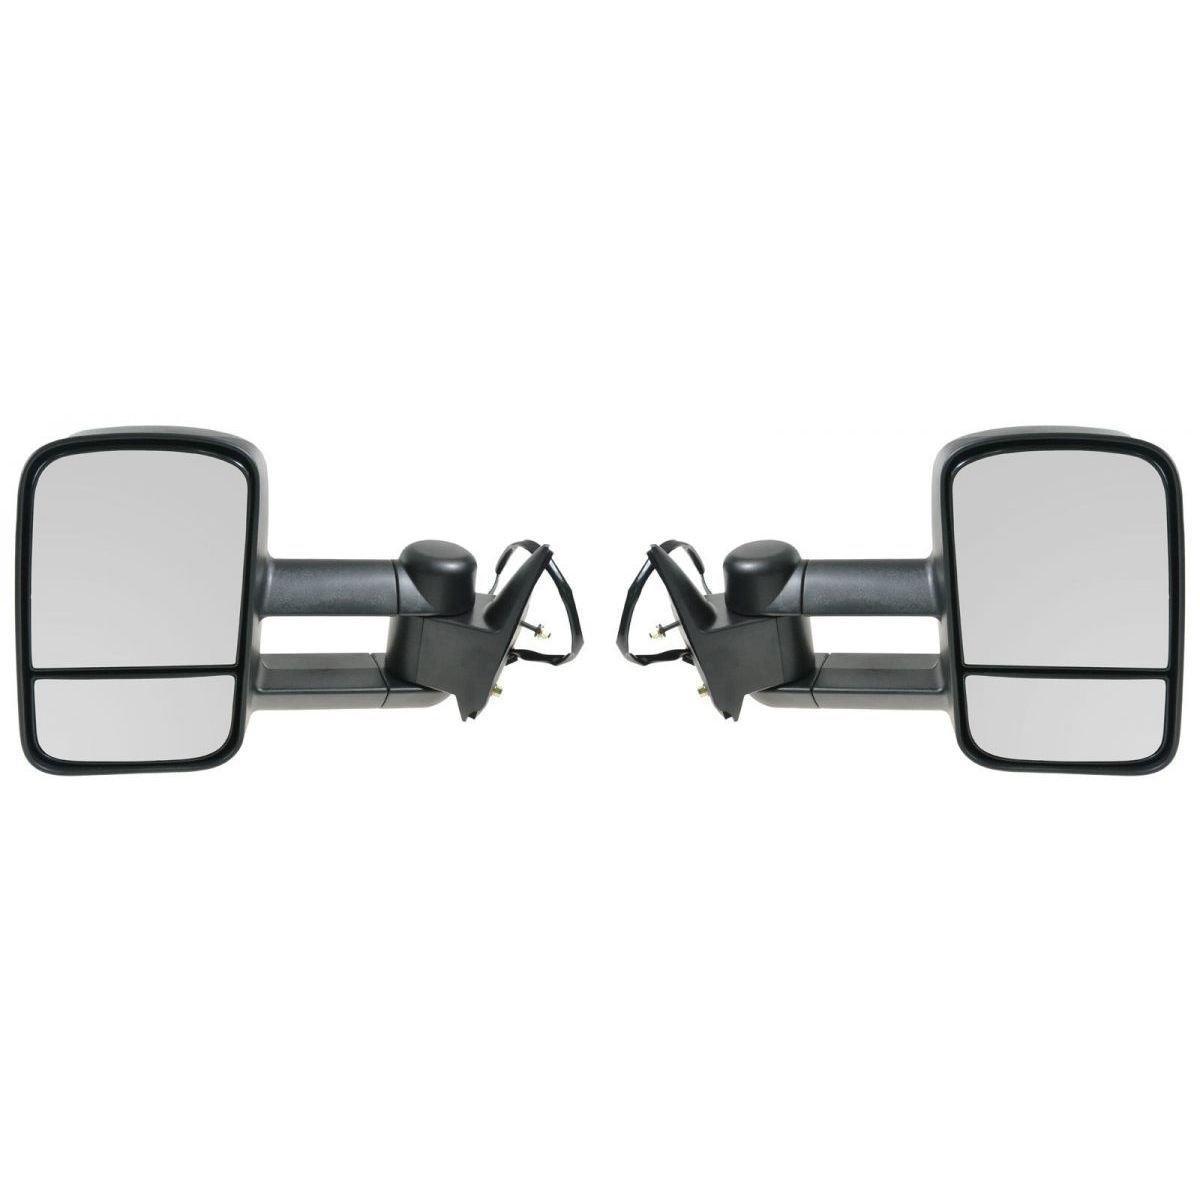 APA Chevrolet Gmc C K 1500 2500 3500 Truck 88 - 98 Tow Power Mirror Left Right Set by Auto Parts Avenue